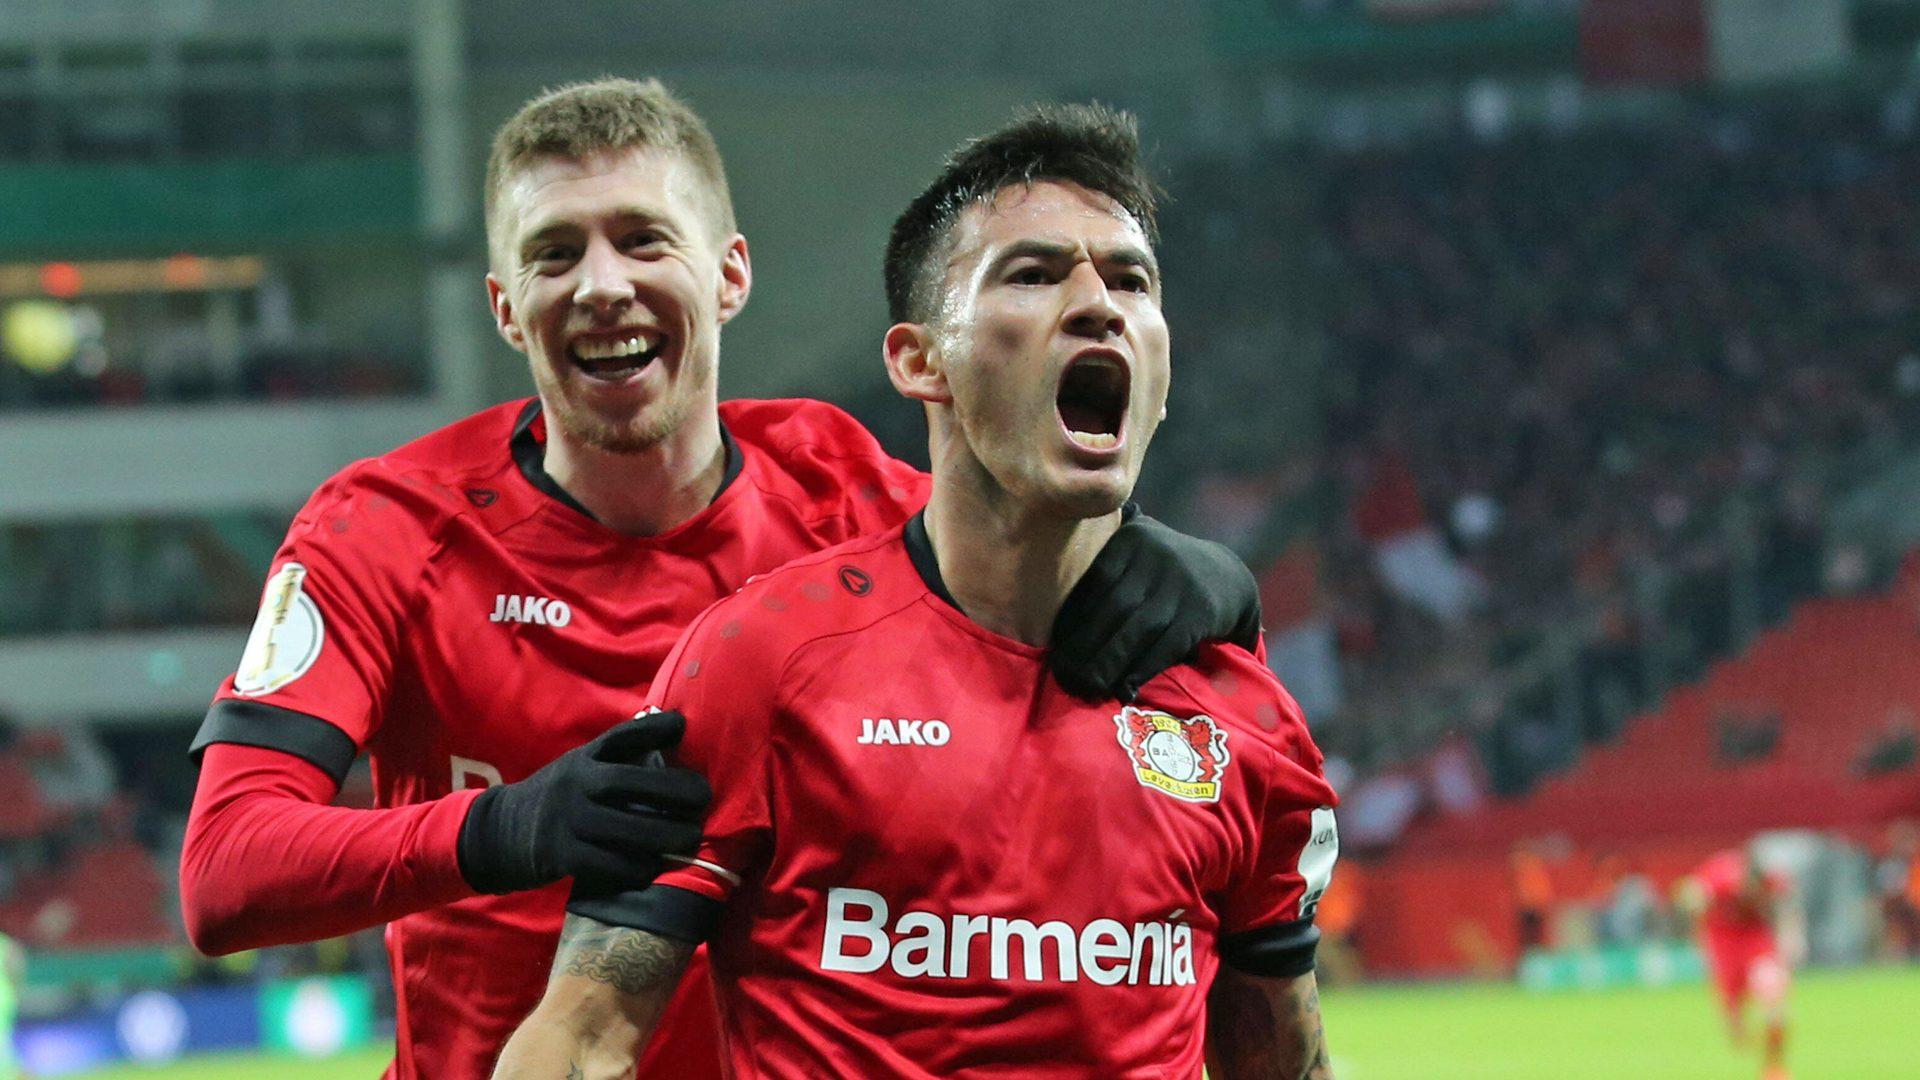 Bundesliga | Bayer Leverkusen through to DFB Cup semi-finals after ...